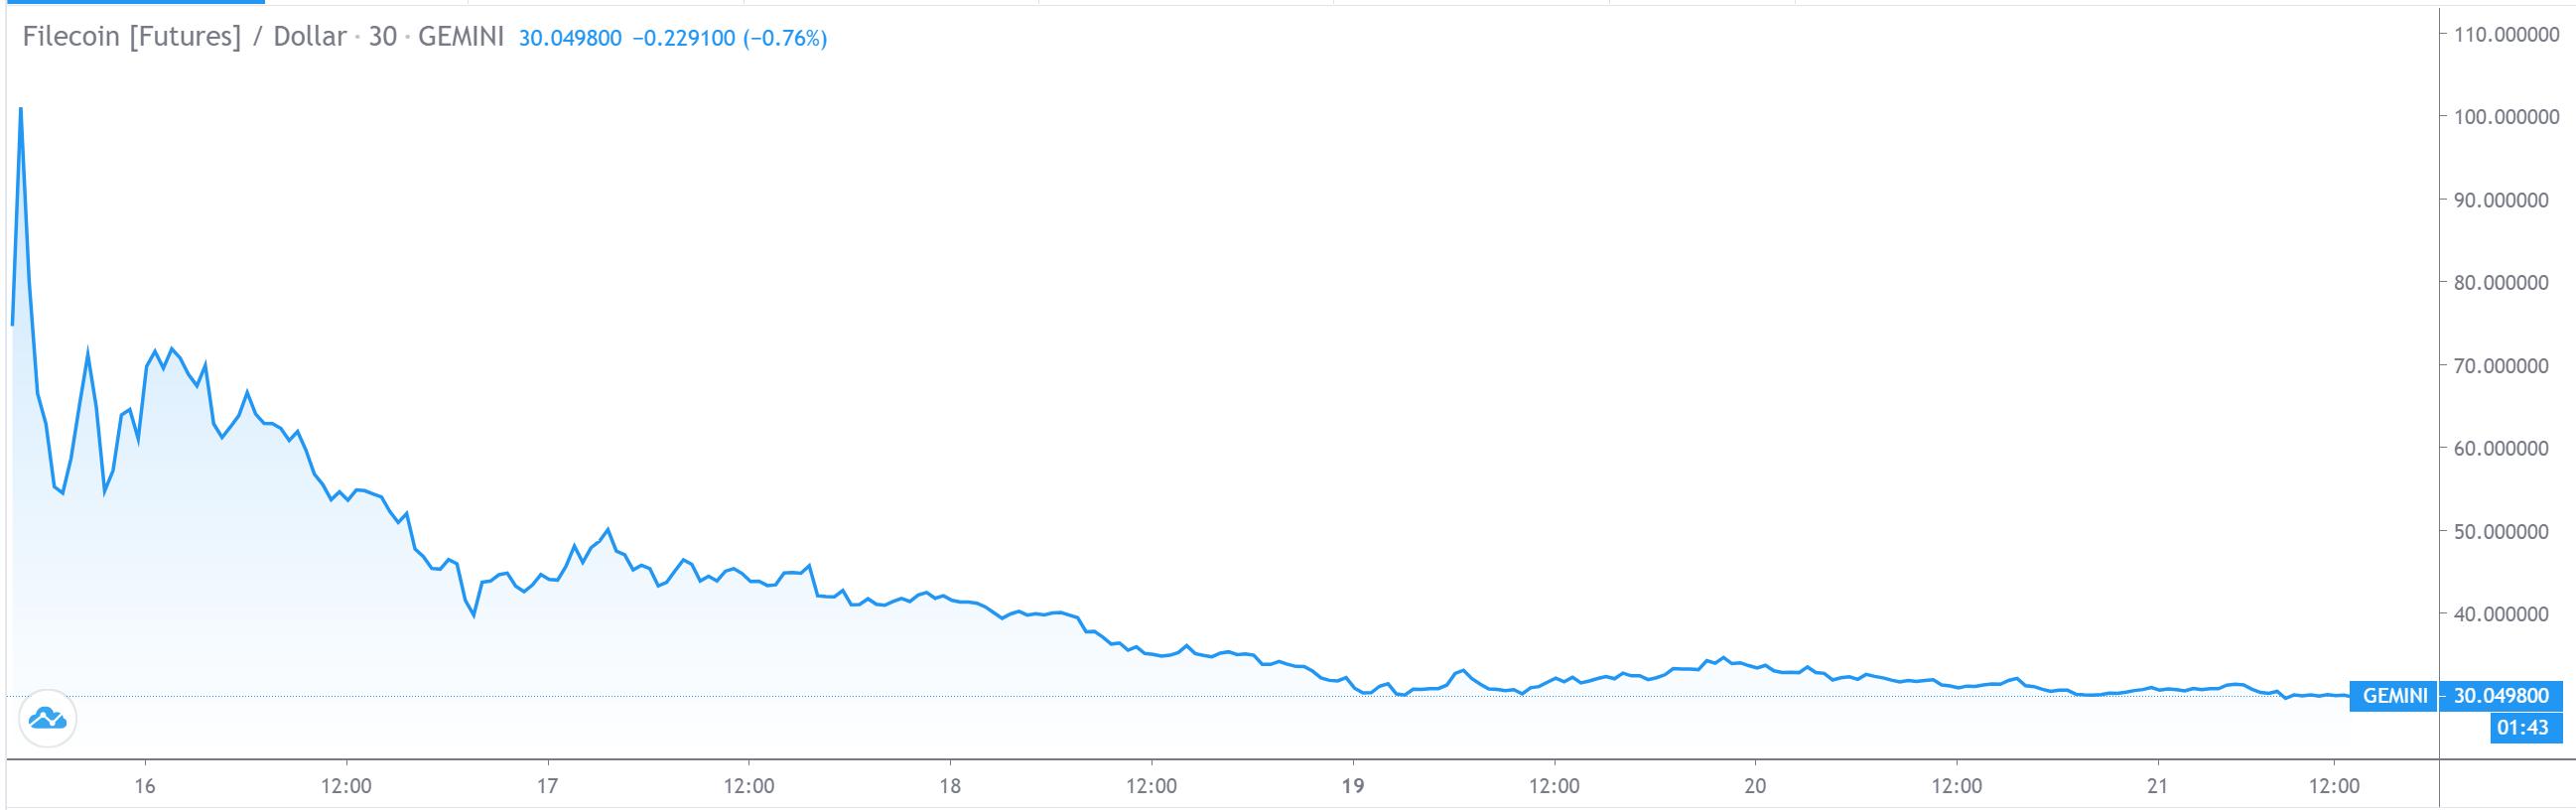 FIL/USD price chart on tradingview